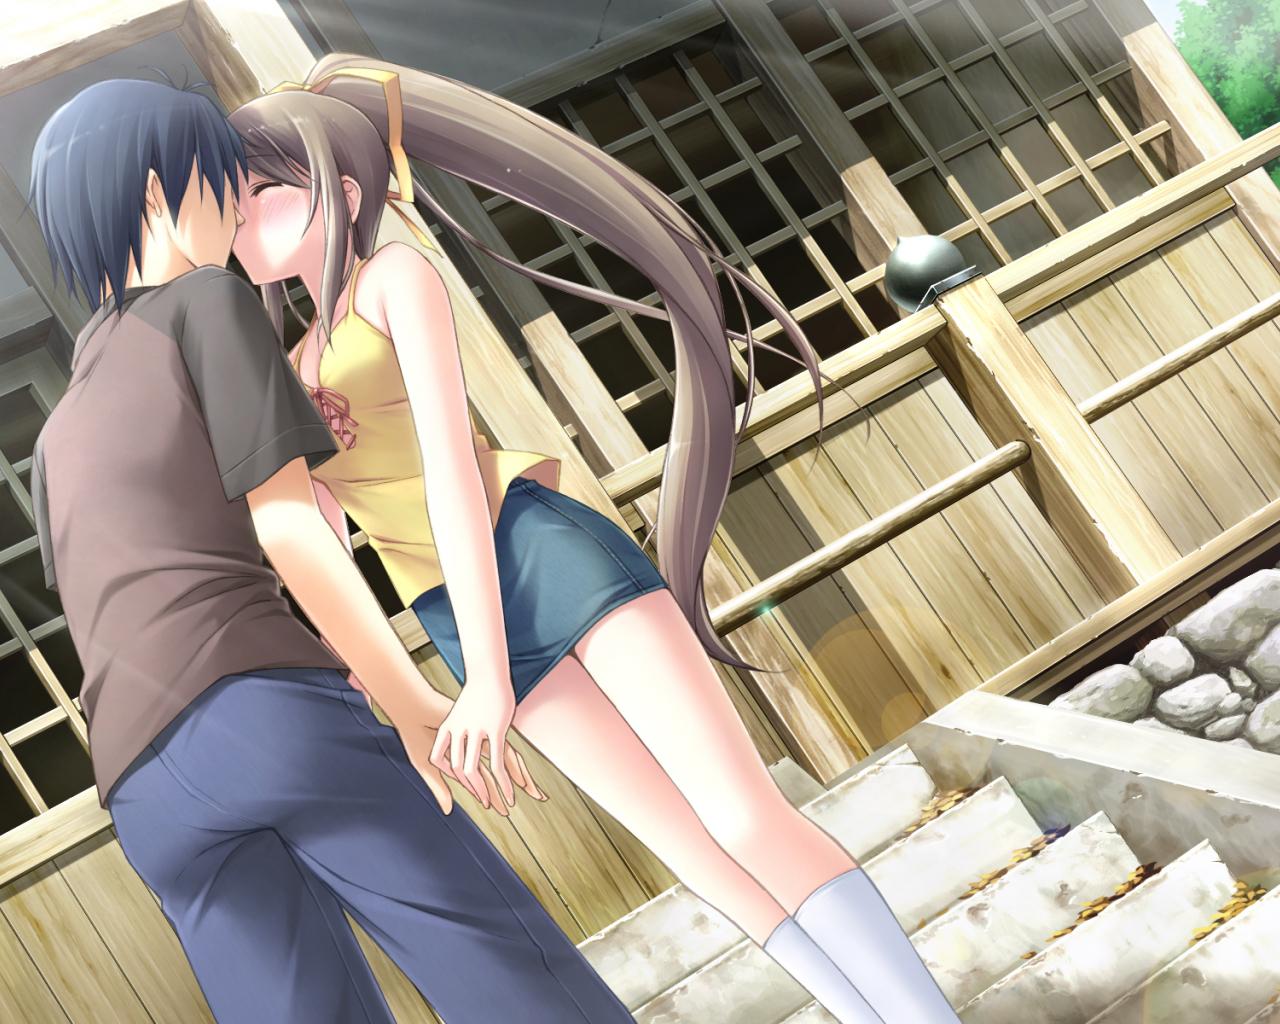 Free Download Wallpapers Hd Sweet Kiss Anime Fond D Cran